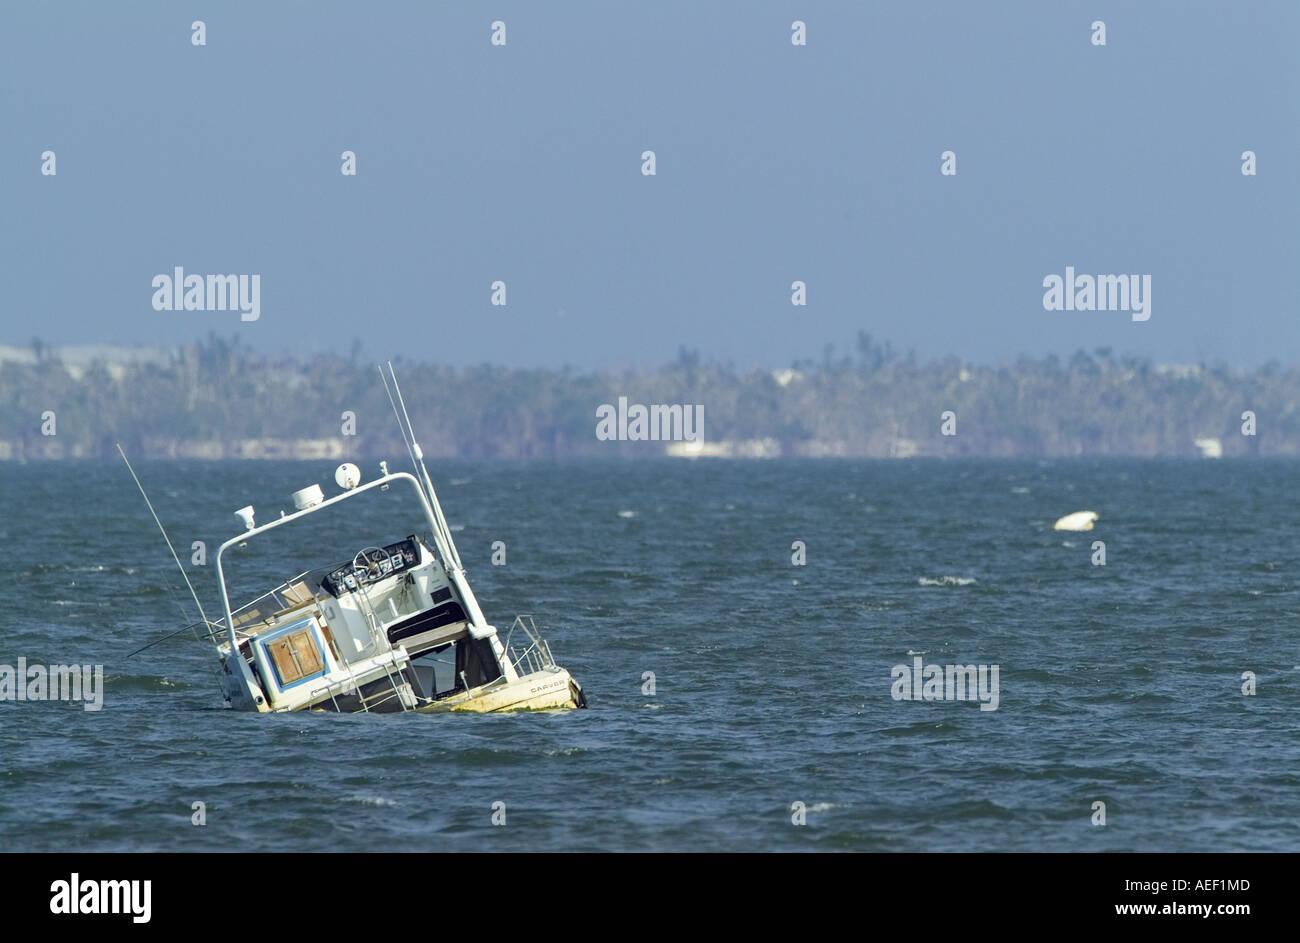 versunkene Schäden Motorboot Hurrikan Schaden Verlust des Immobilienvermögens versenkt Schiffbruch Stockbild